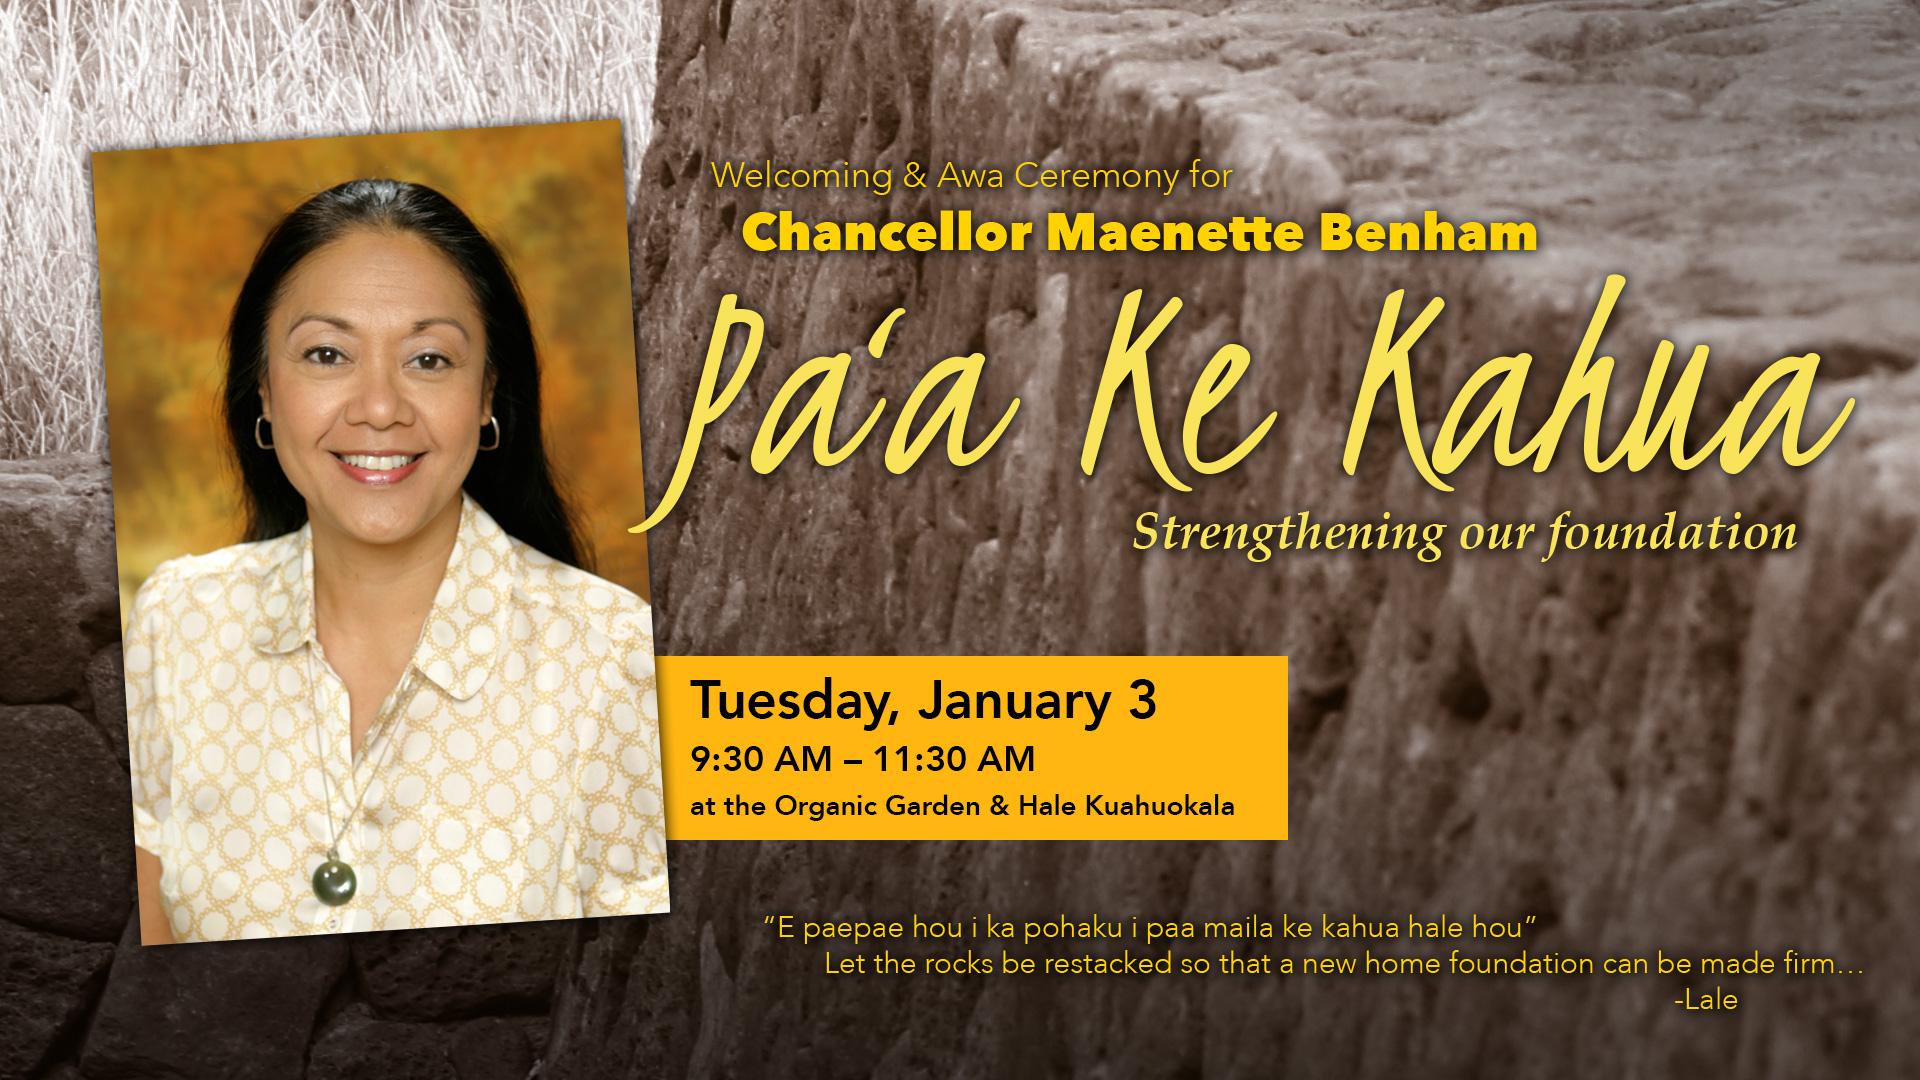 Flyer for welcome ceremony for Chancellor Maenette Benham, Jan. 3, 2017.